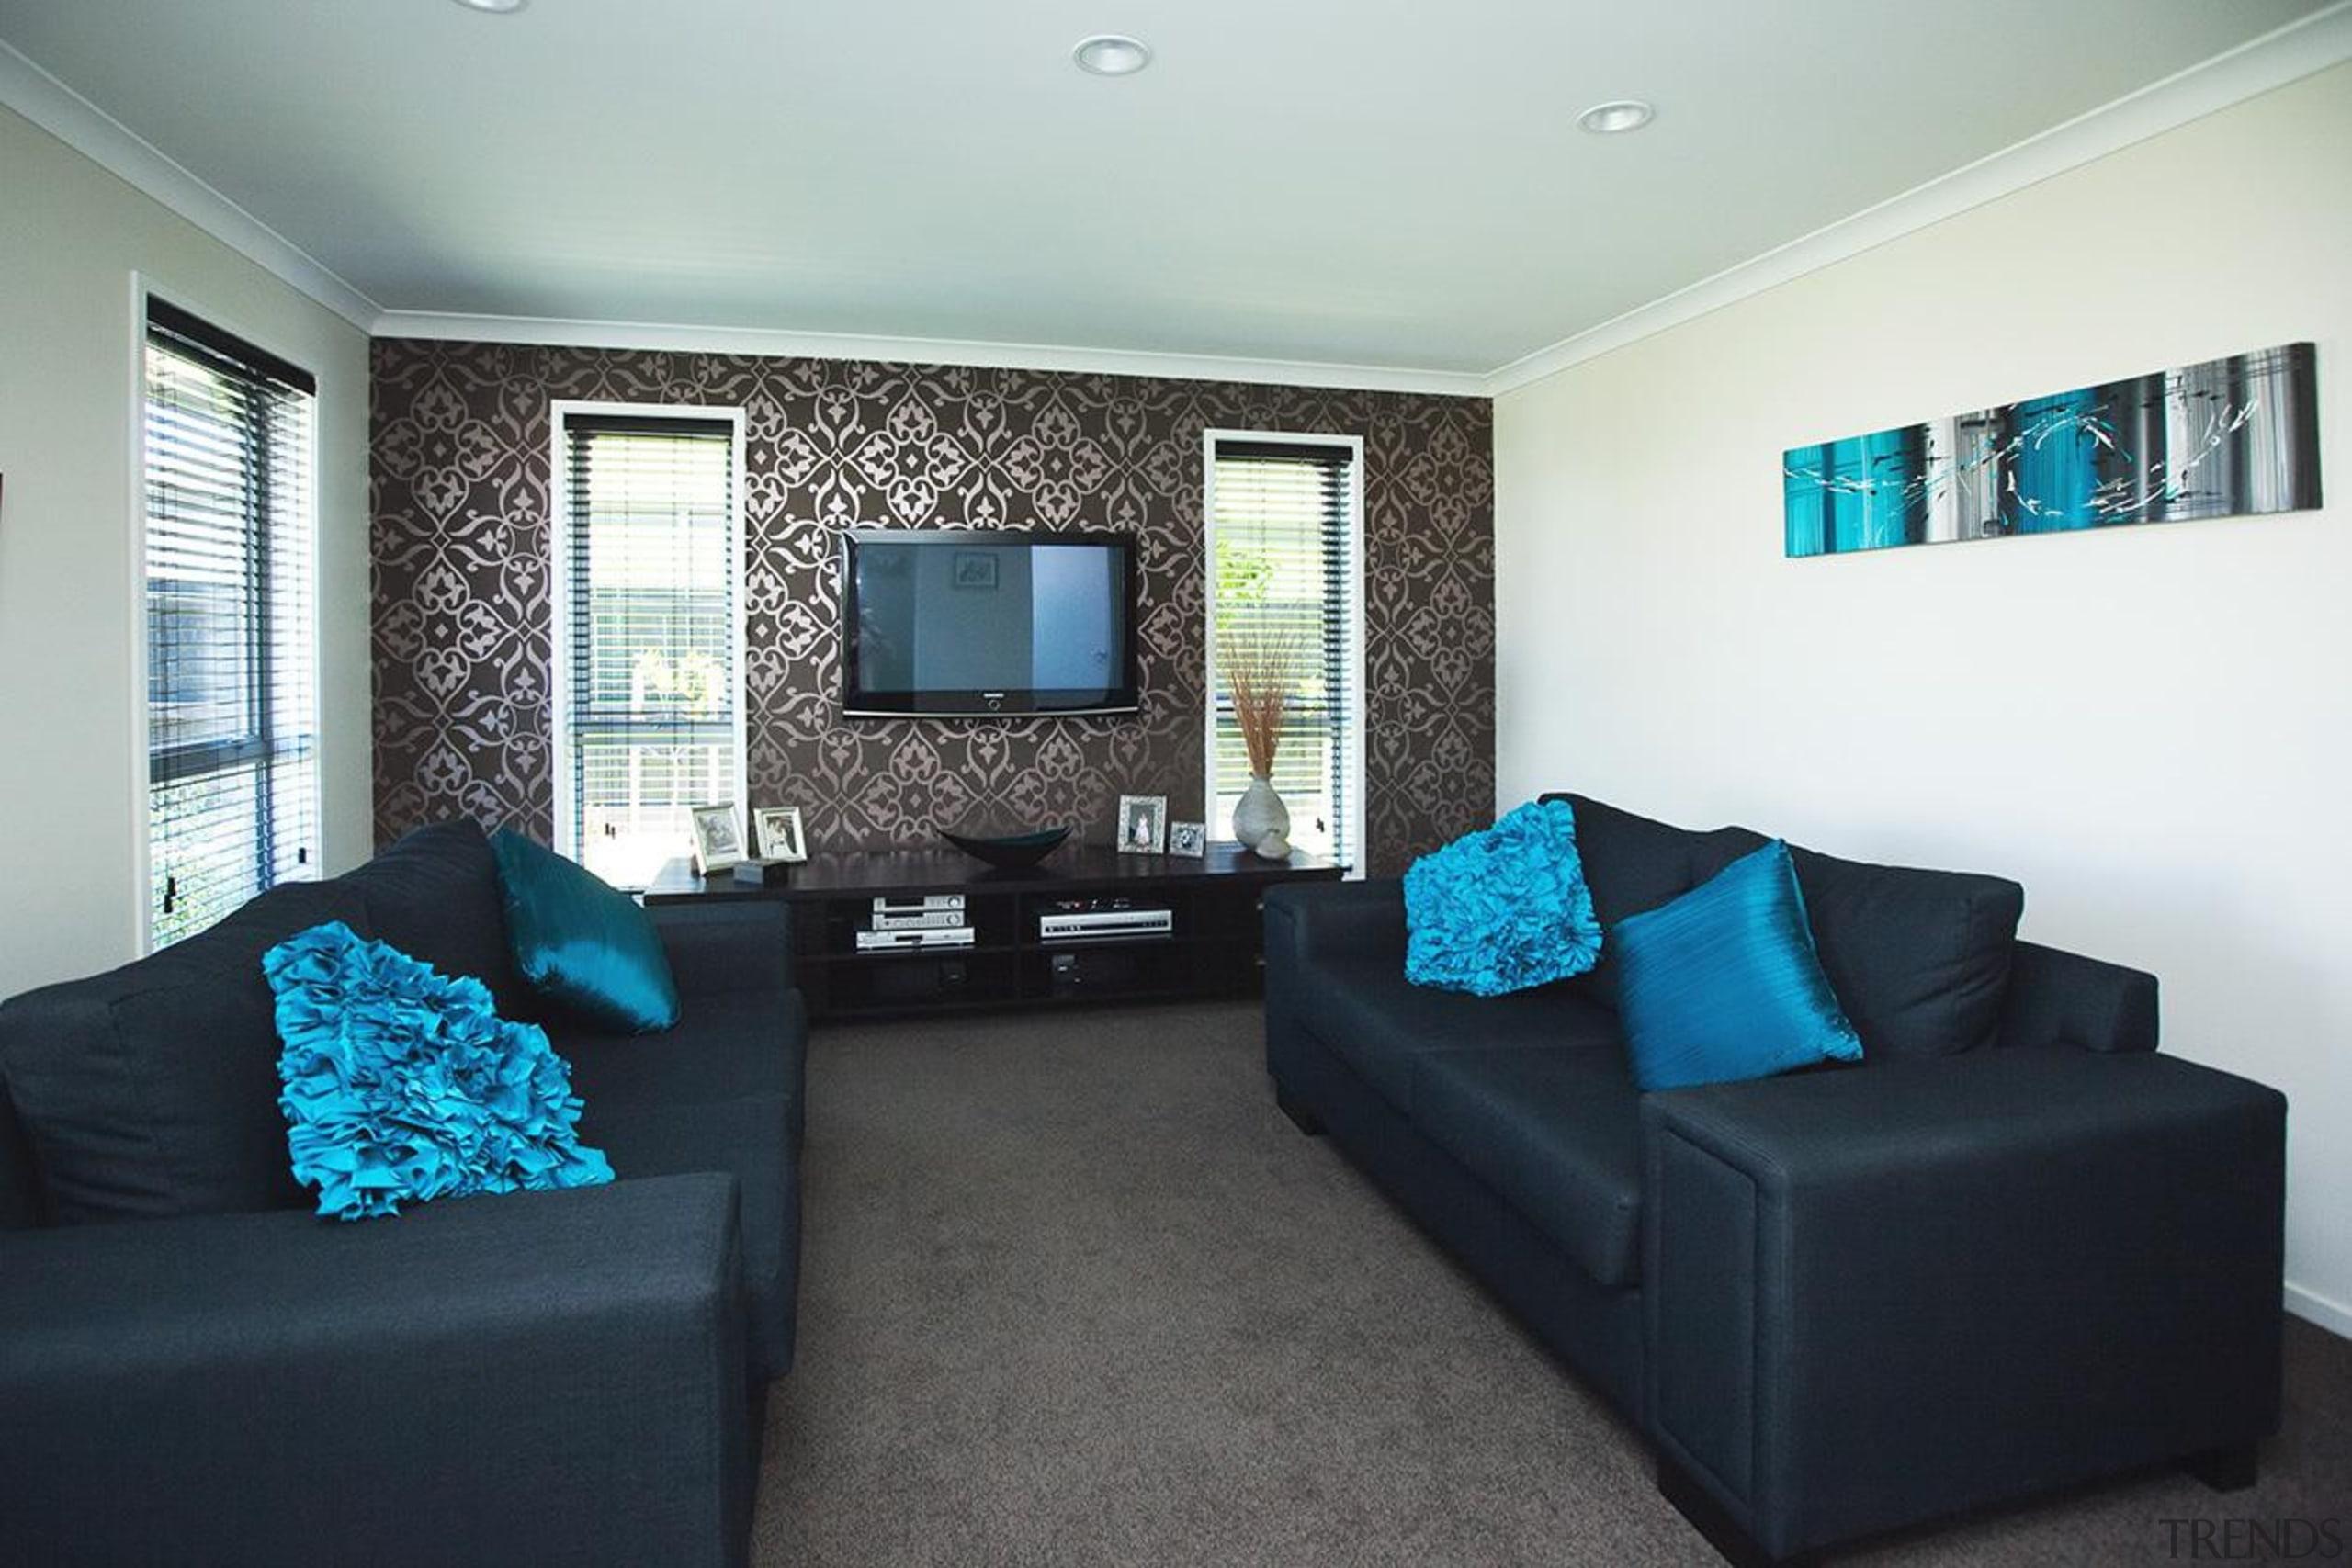 For more information, please visit www.gjgardner.co.nz ceiling, home, interior design, living room, property, real estate, room, black, white